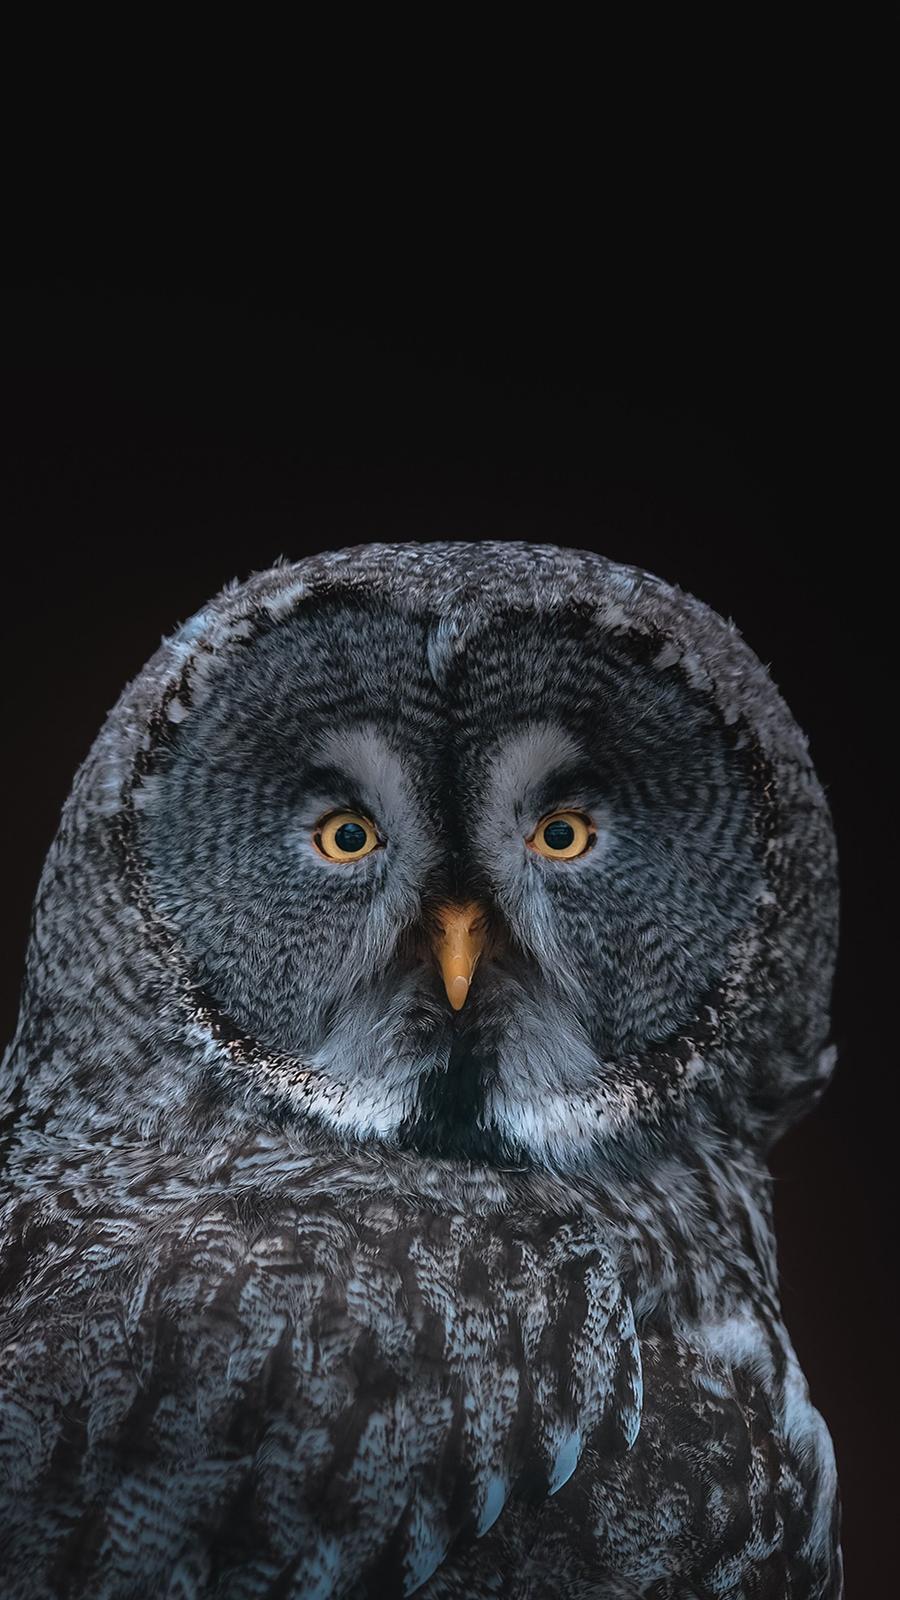 Bird, Owl Full HD Wallpapers Free Download